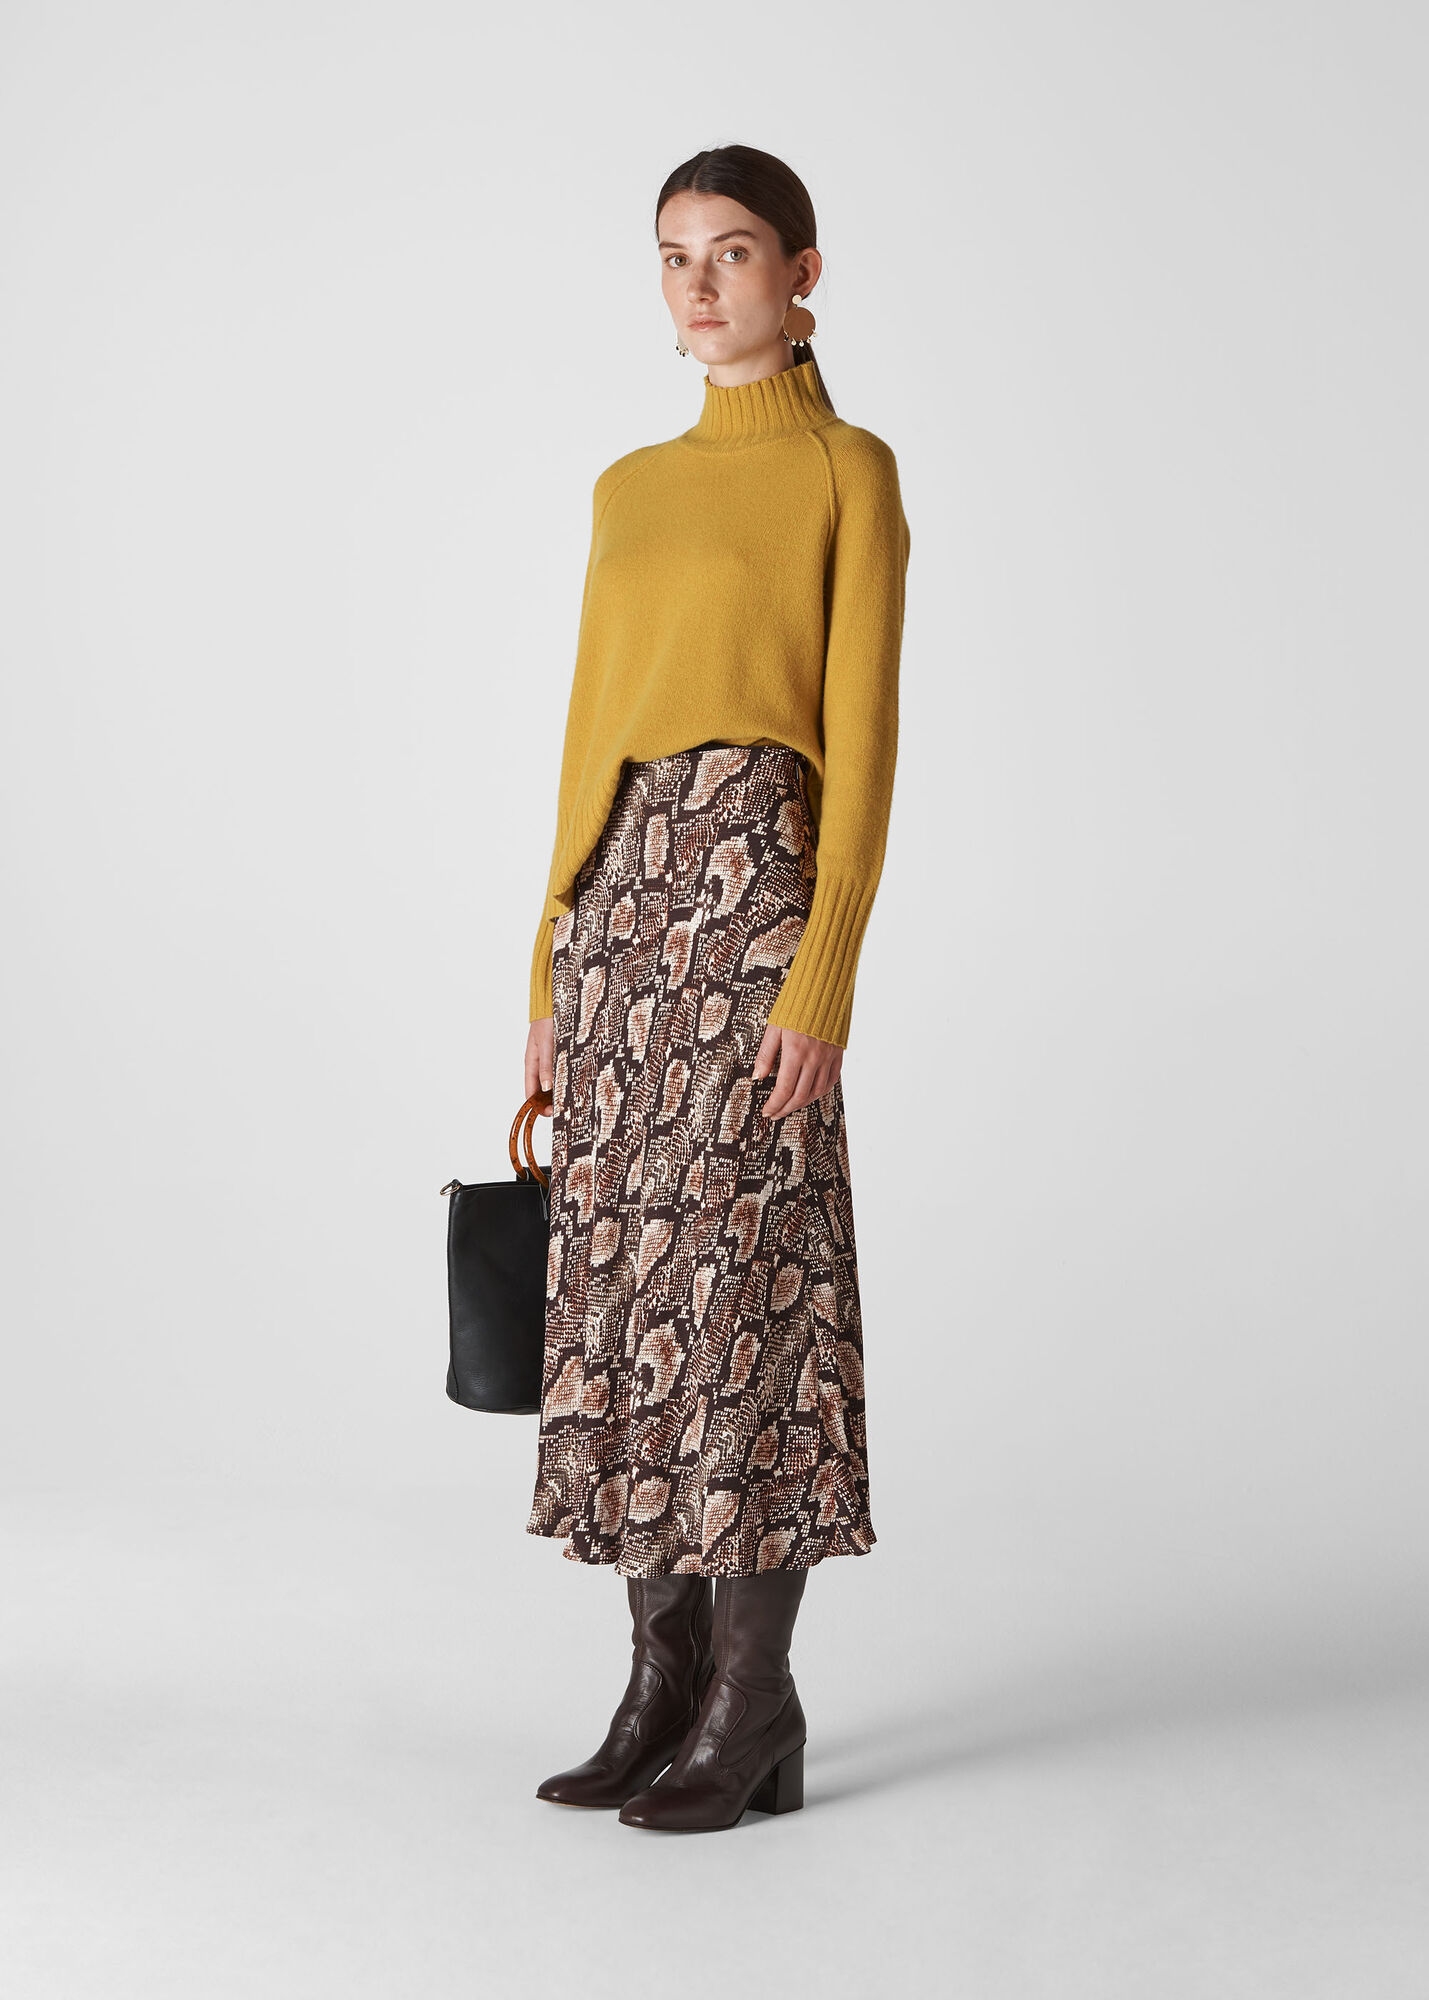 Snake Print Bias Cut Skirt